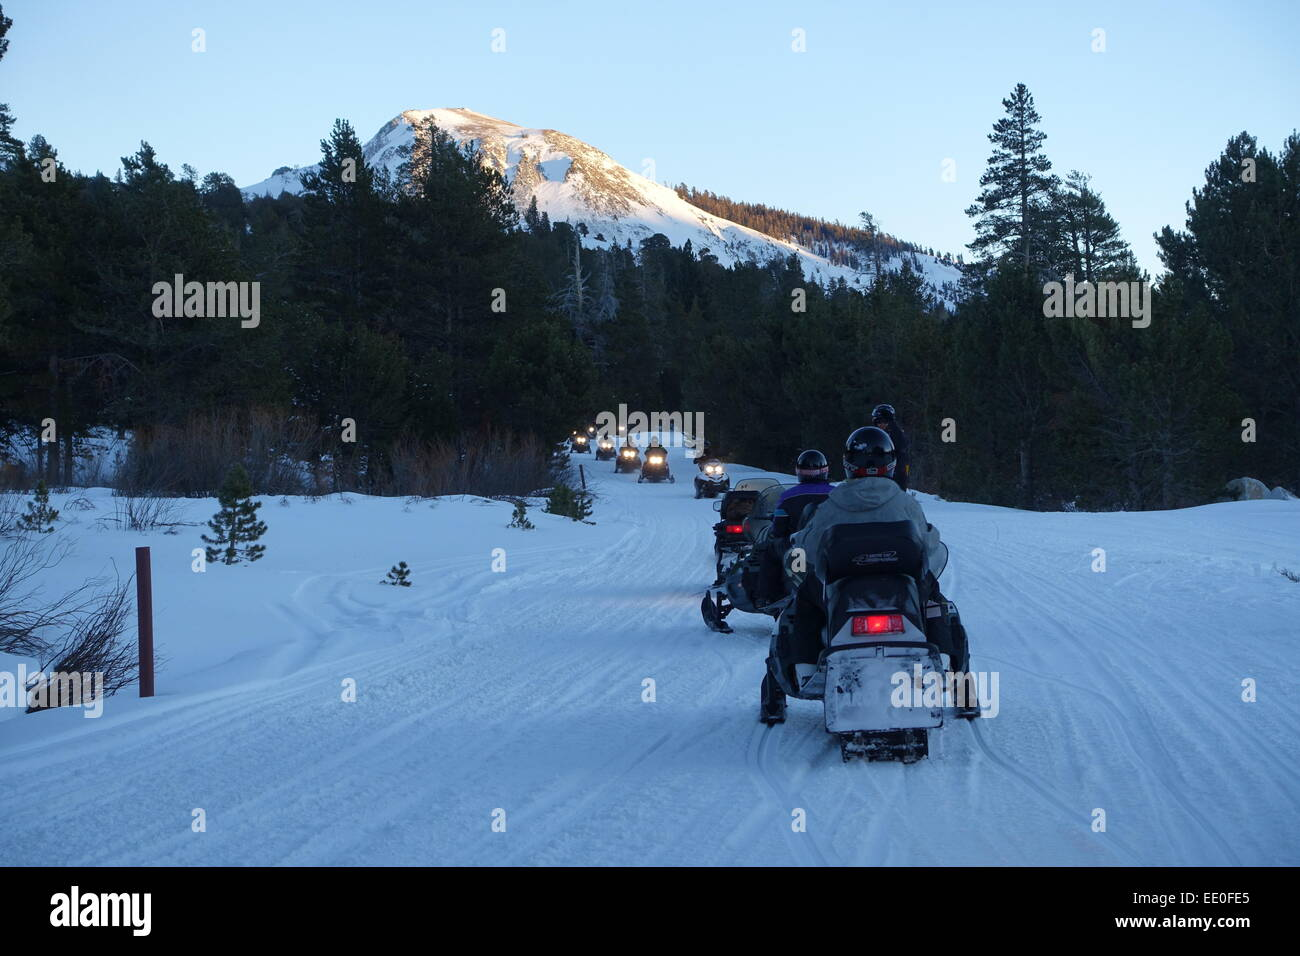 usa-california-ca-lake-tahoe-sierra-mountains-snowmobiling-in-hope-EE0FE5.jpg